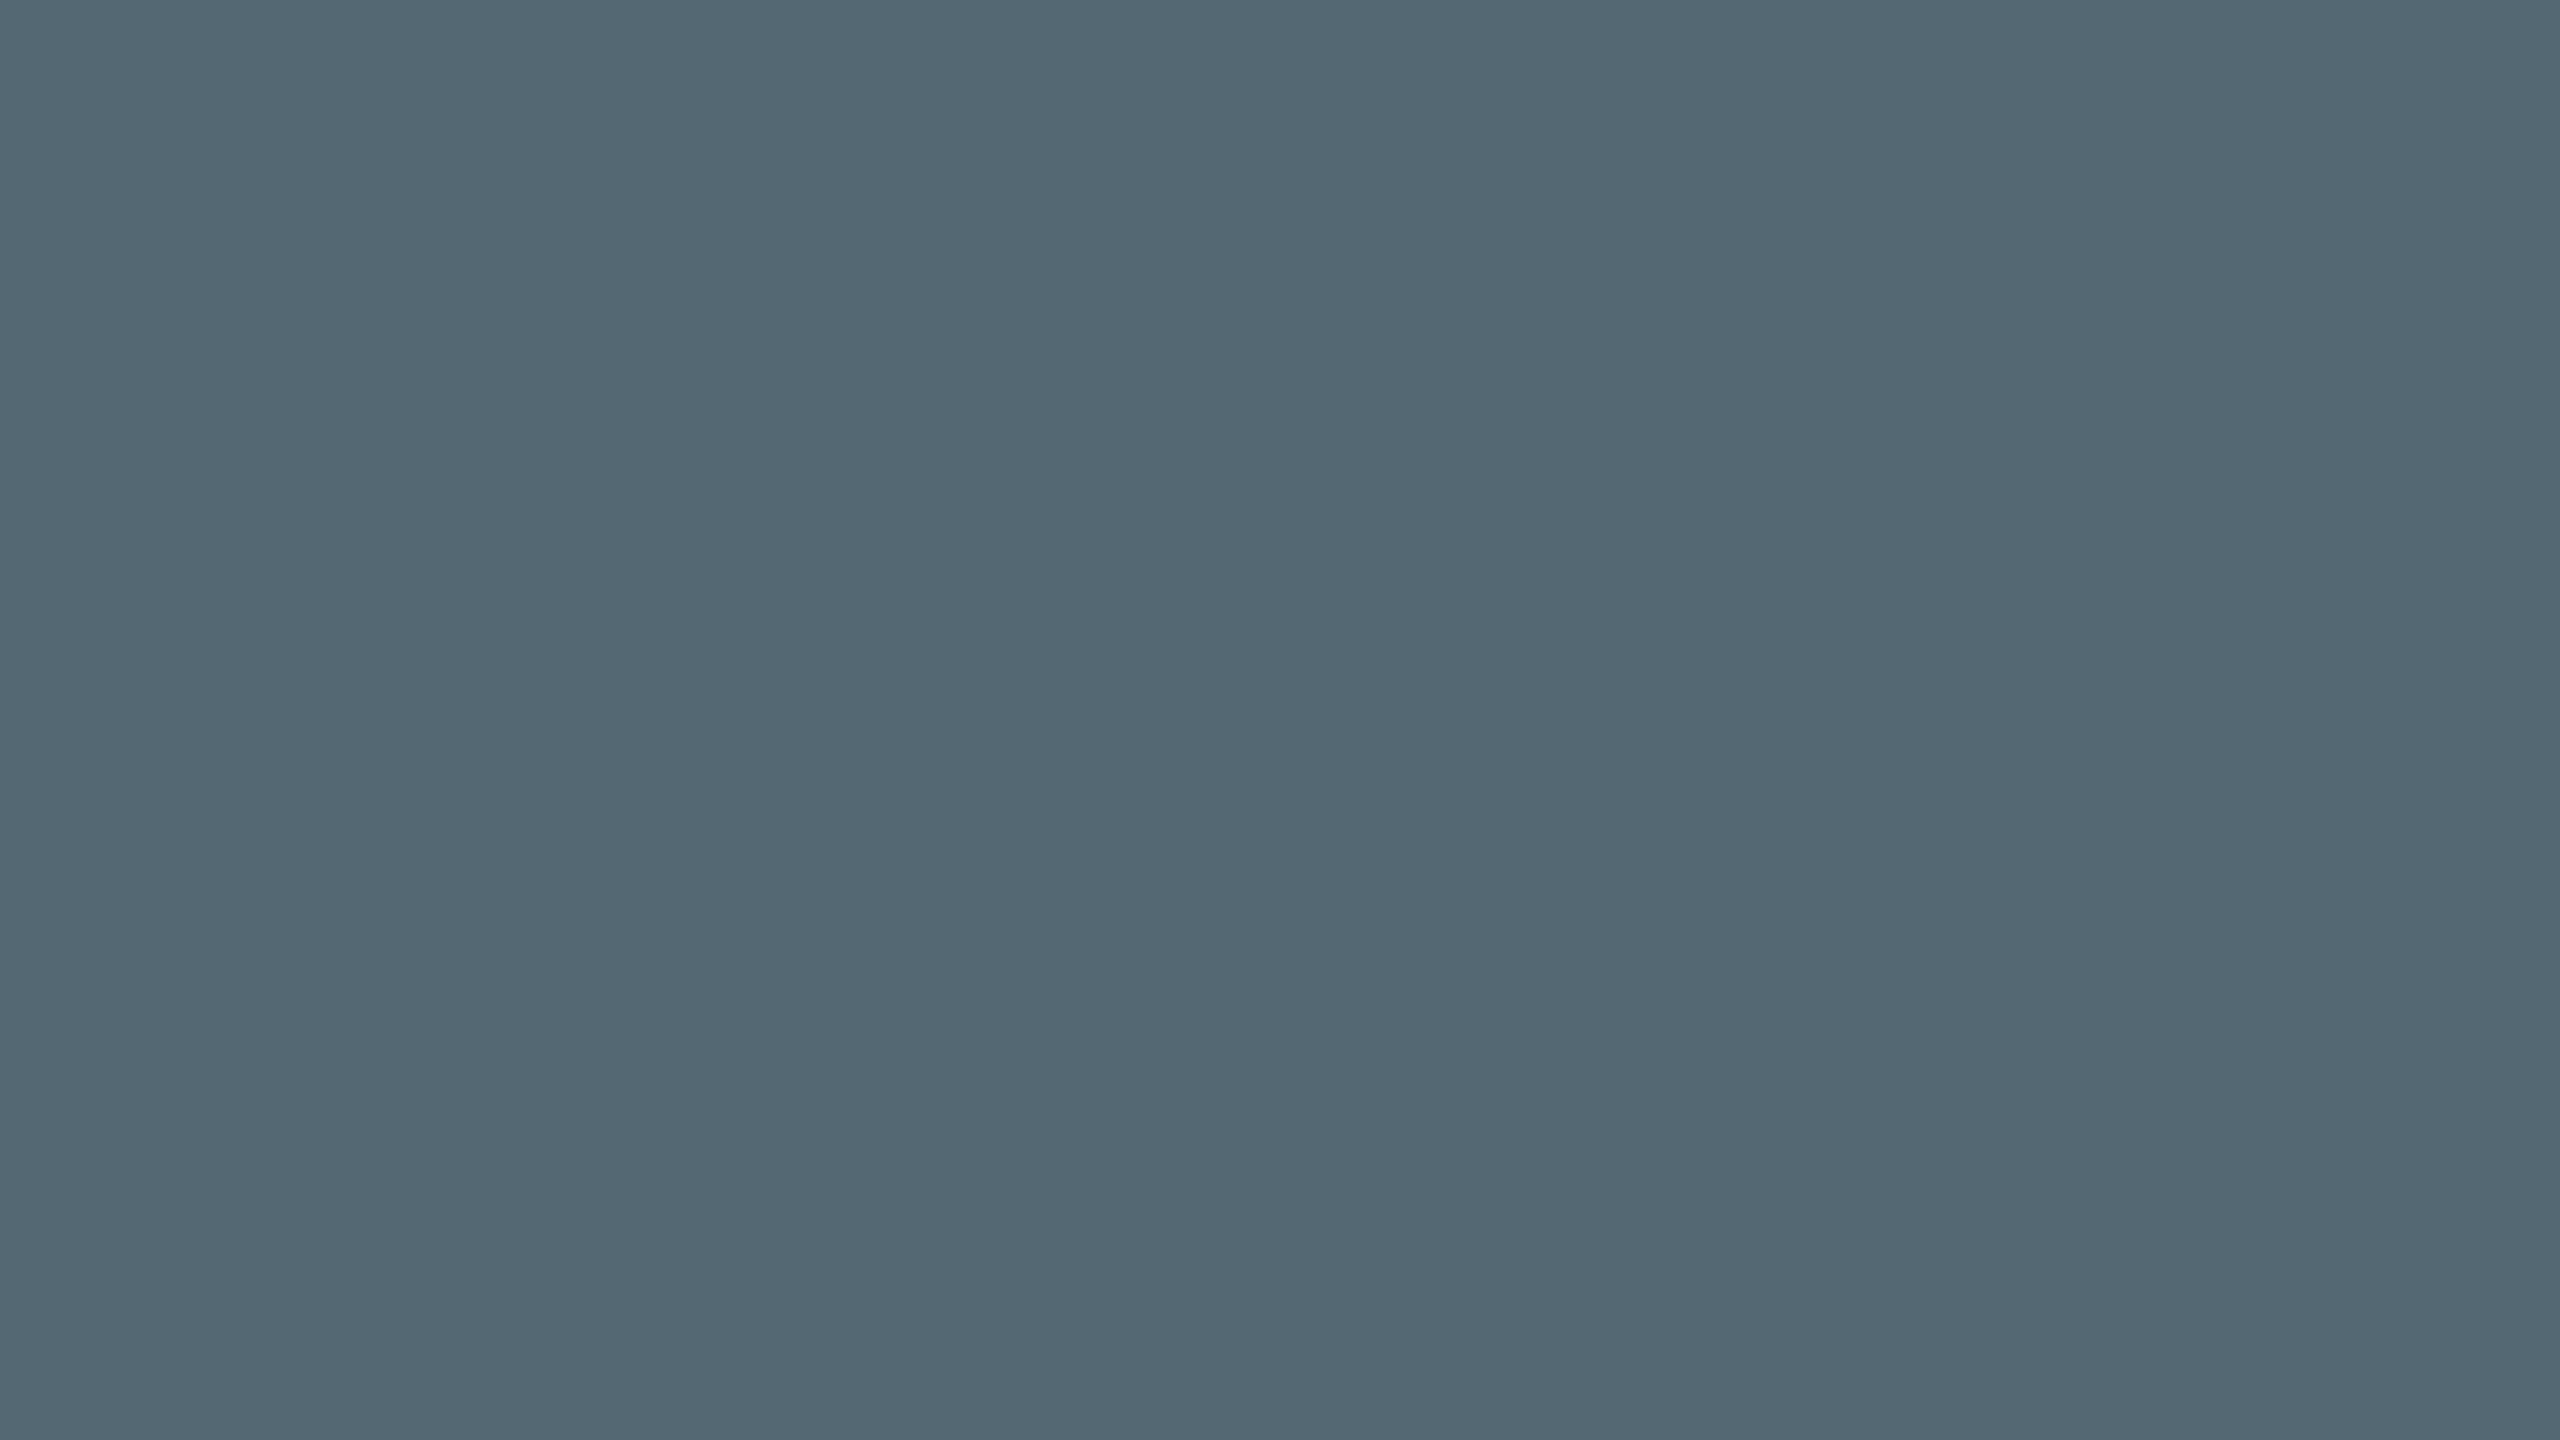 2560x1440 Cadet Solid Color Background